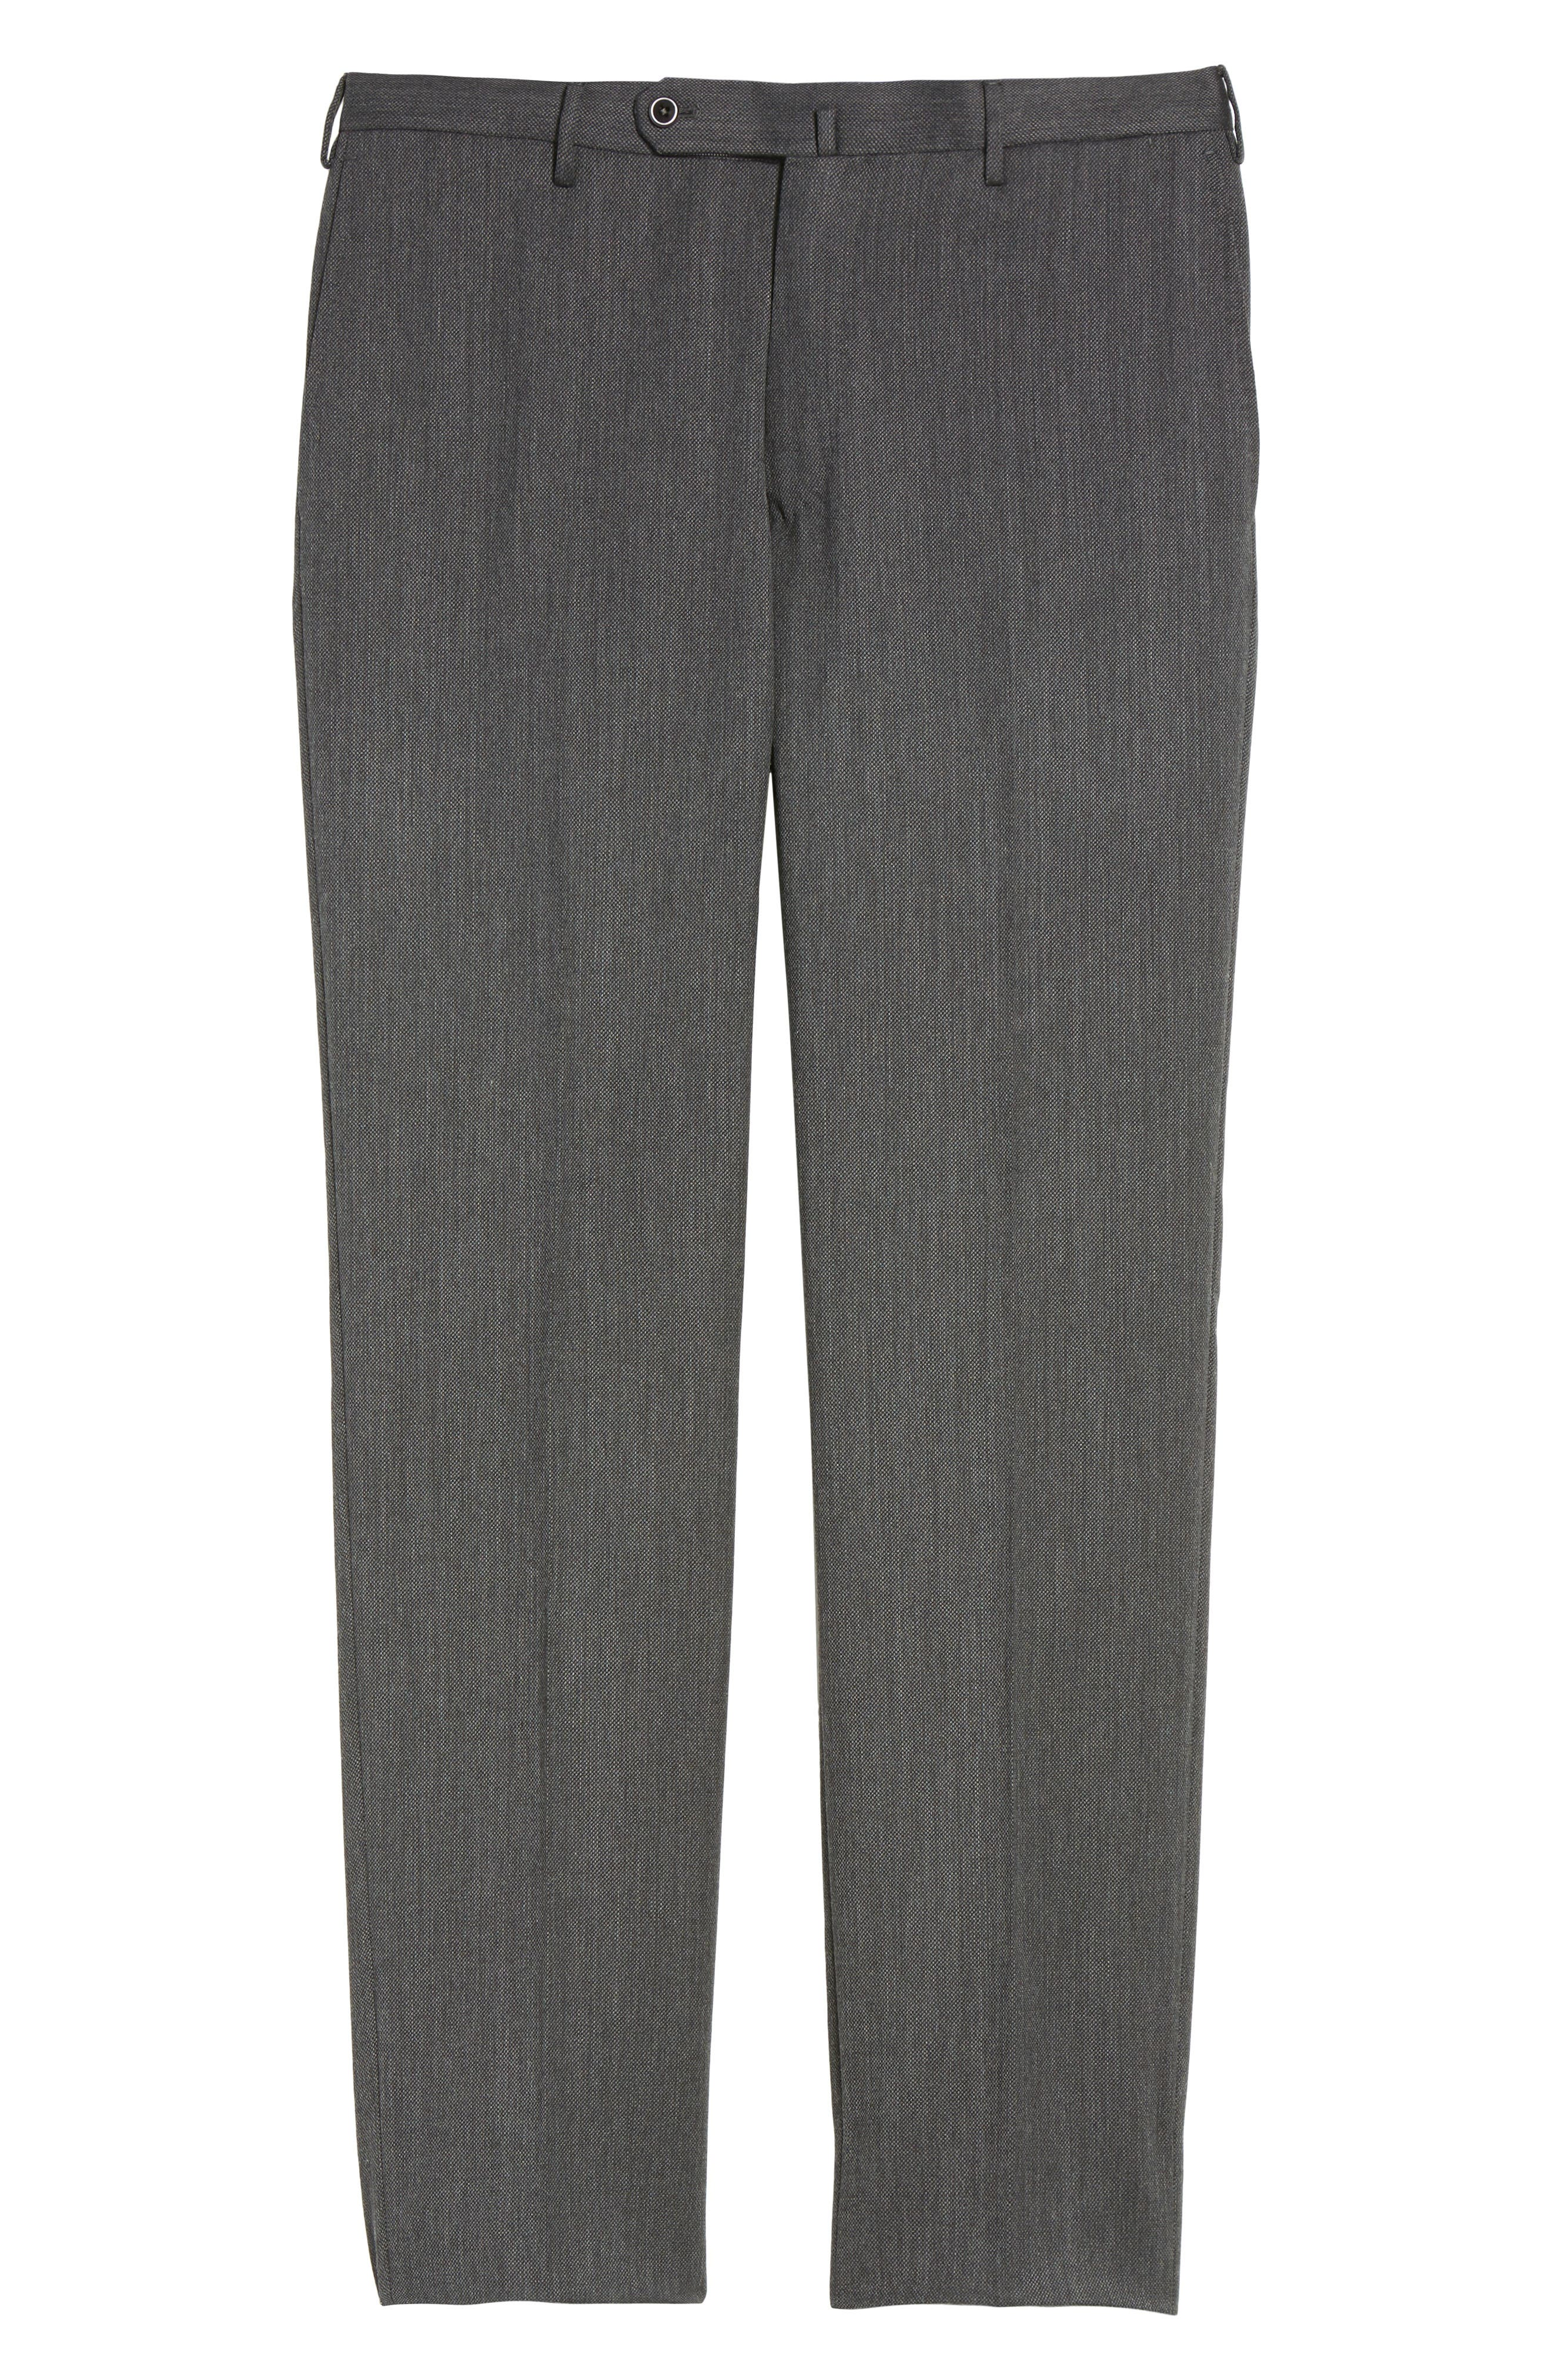 Benson Flat Front Wool Blend Trousers,                             Alternate thumbnail 6, color,                             025